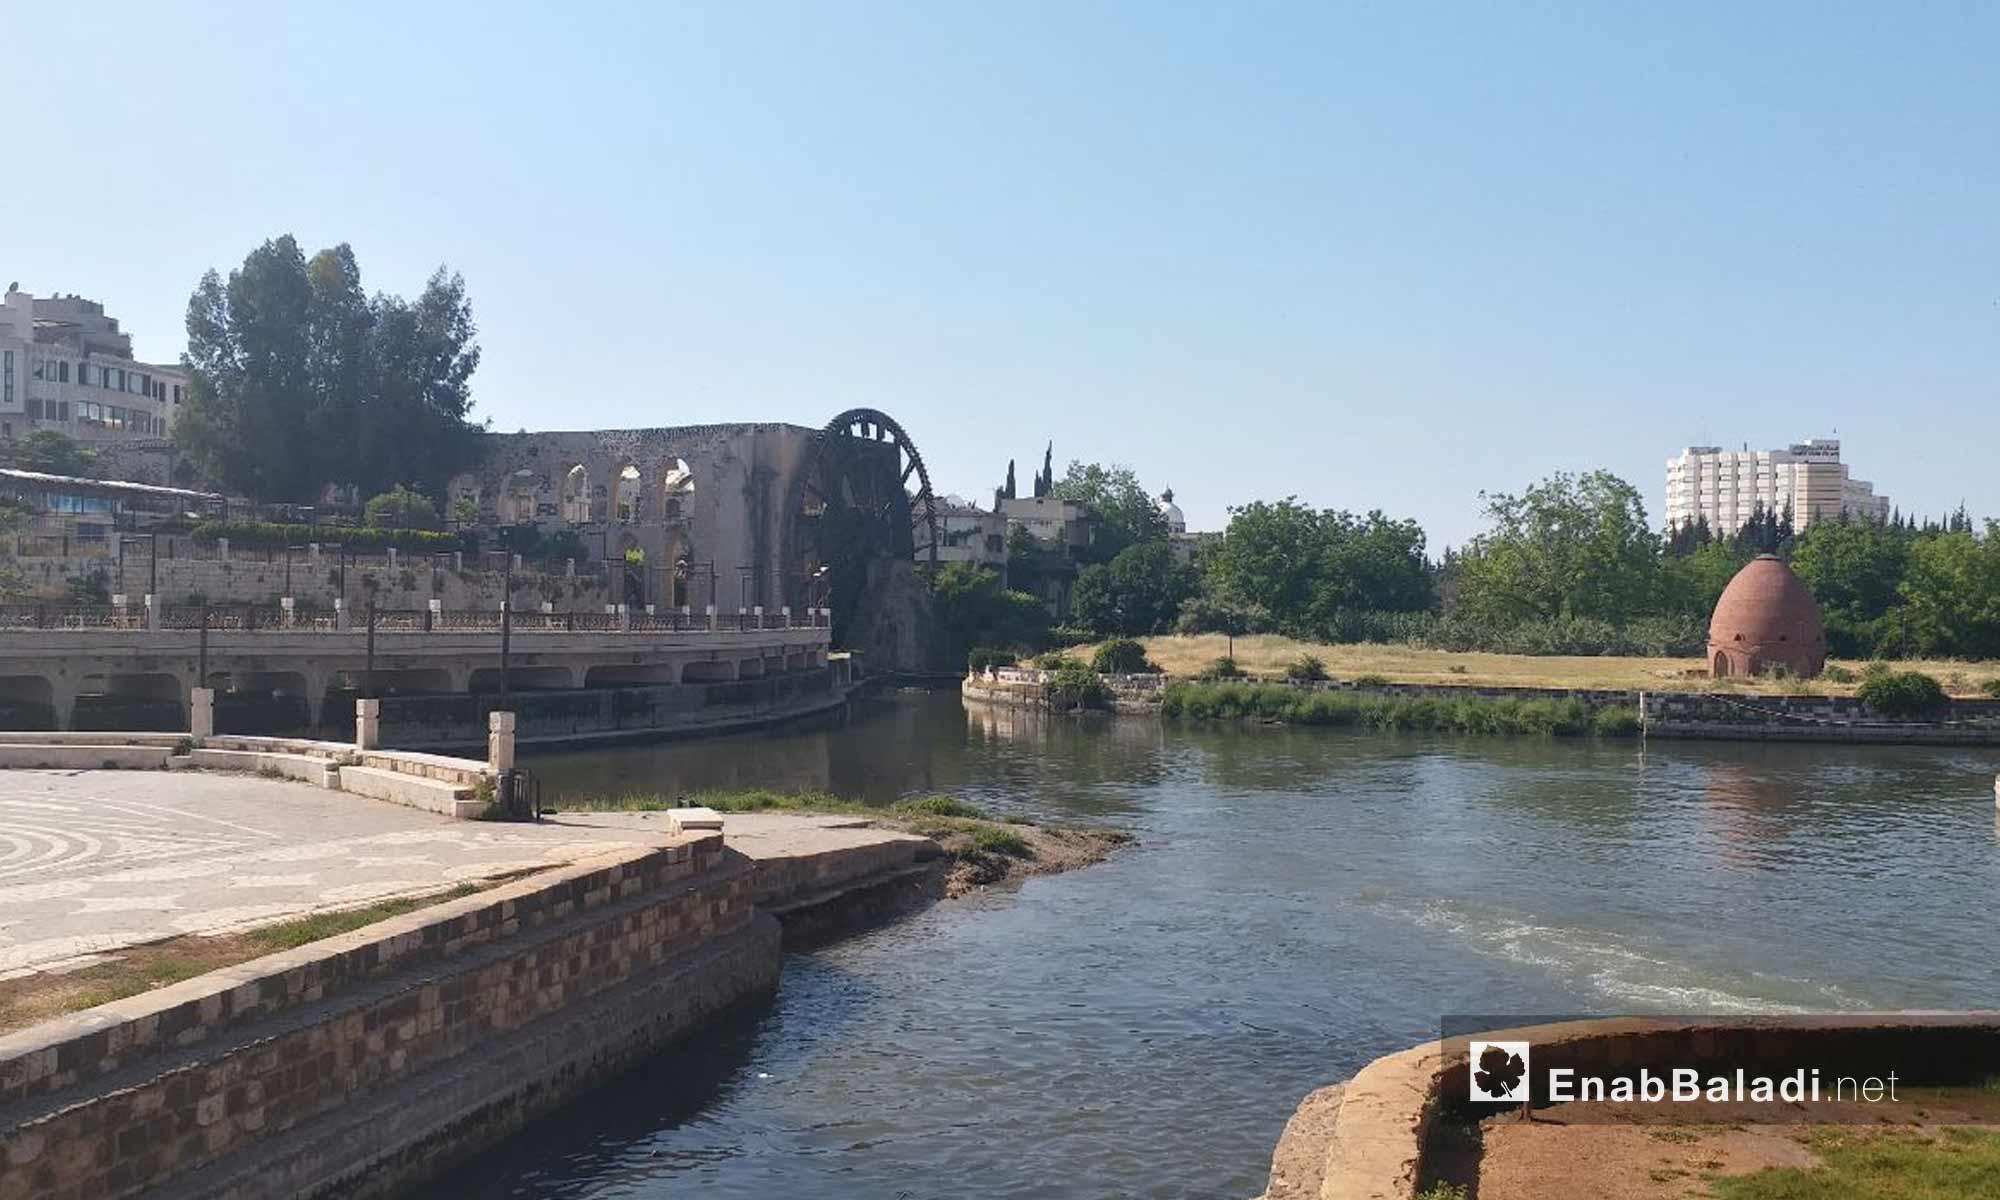 Norias of Hama on the Assi river – May 18, 2019 (Enab Baladi)